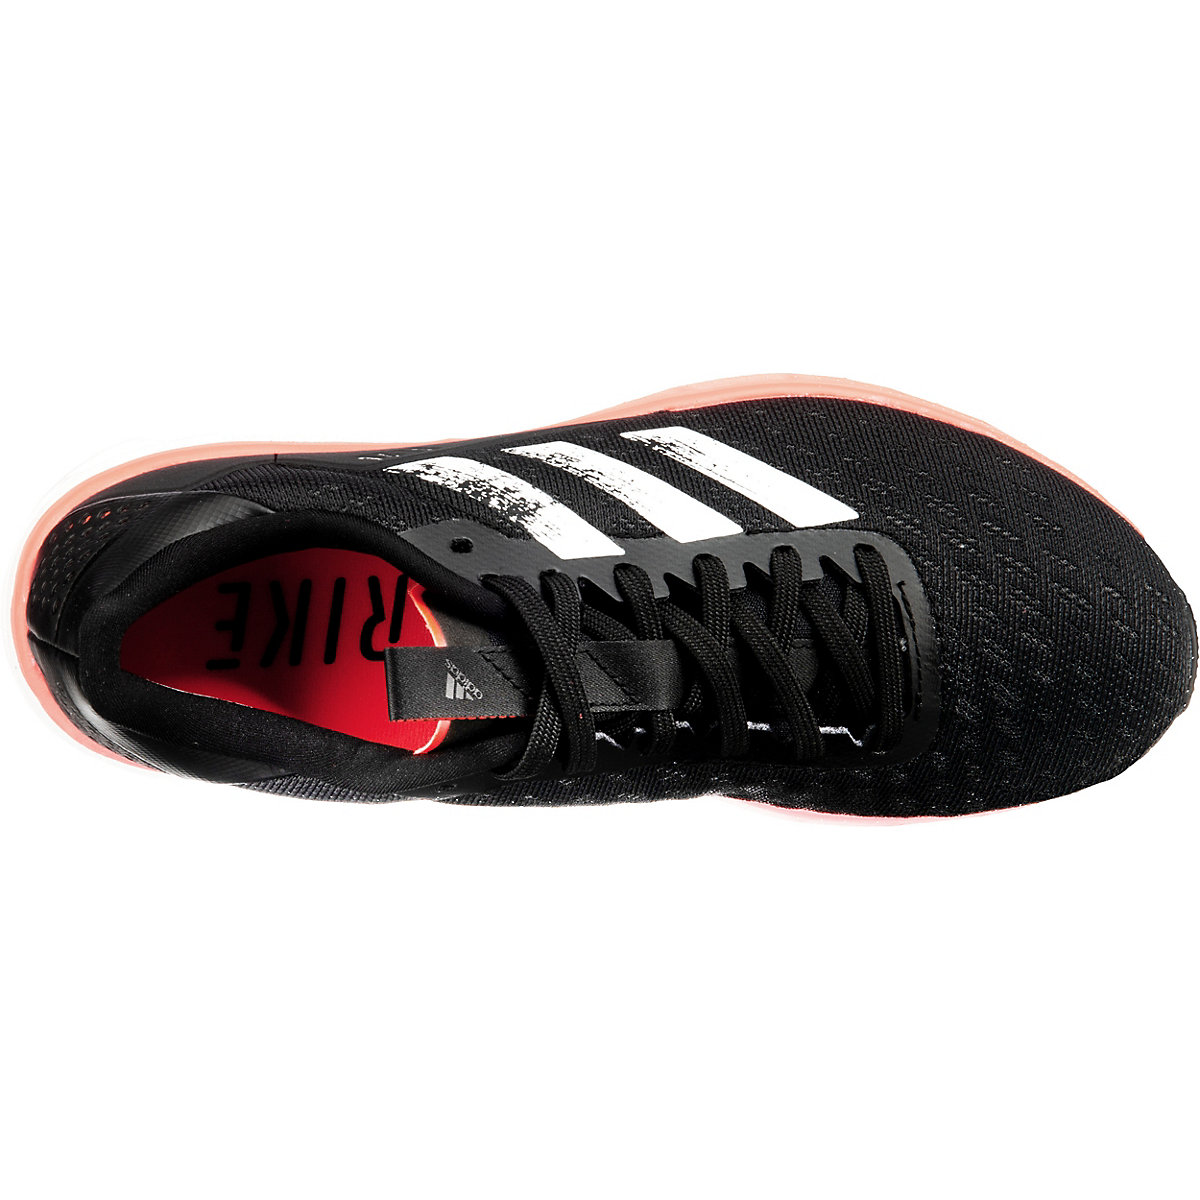 adidas Performance Sl20 W Laufschuhe schwarz